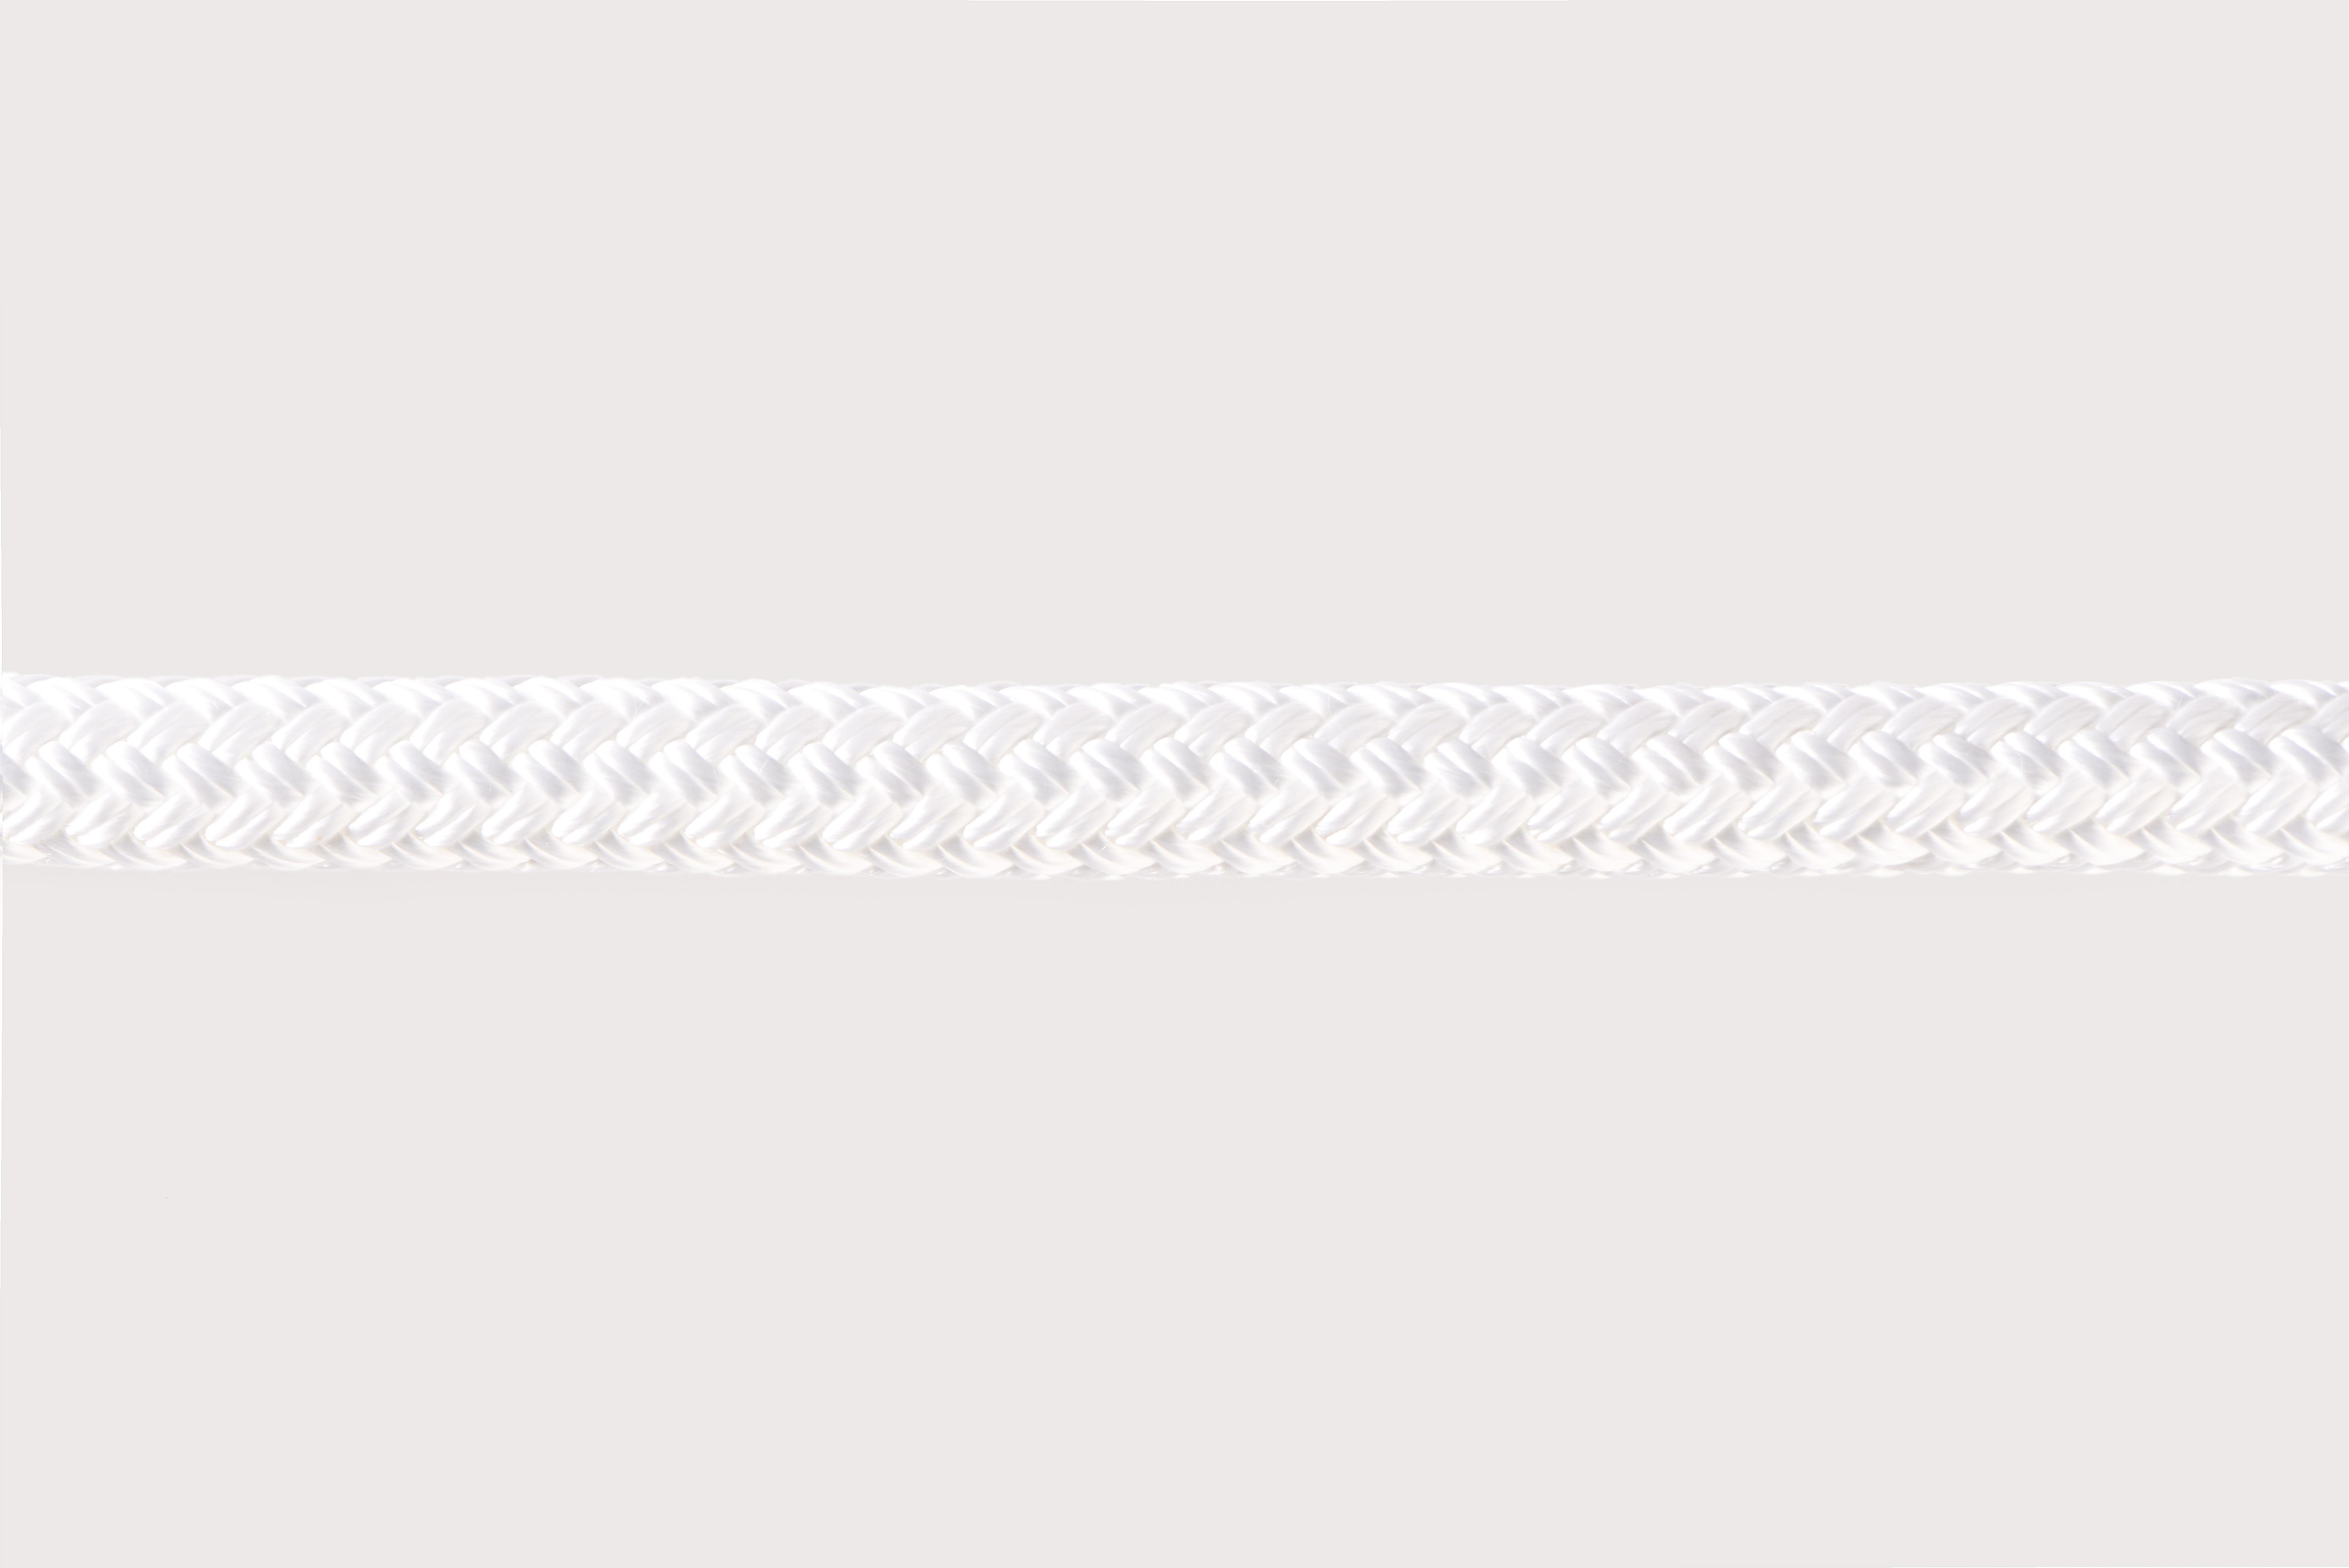 Orion-Cordage-Durastat Double Braid Polyester-White-Horizontal101.jpg